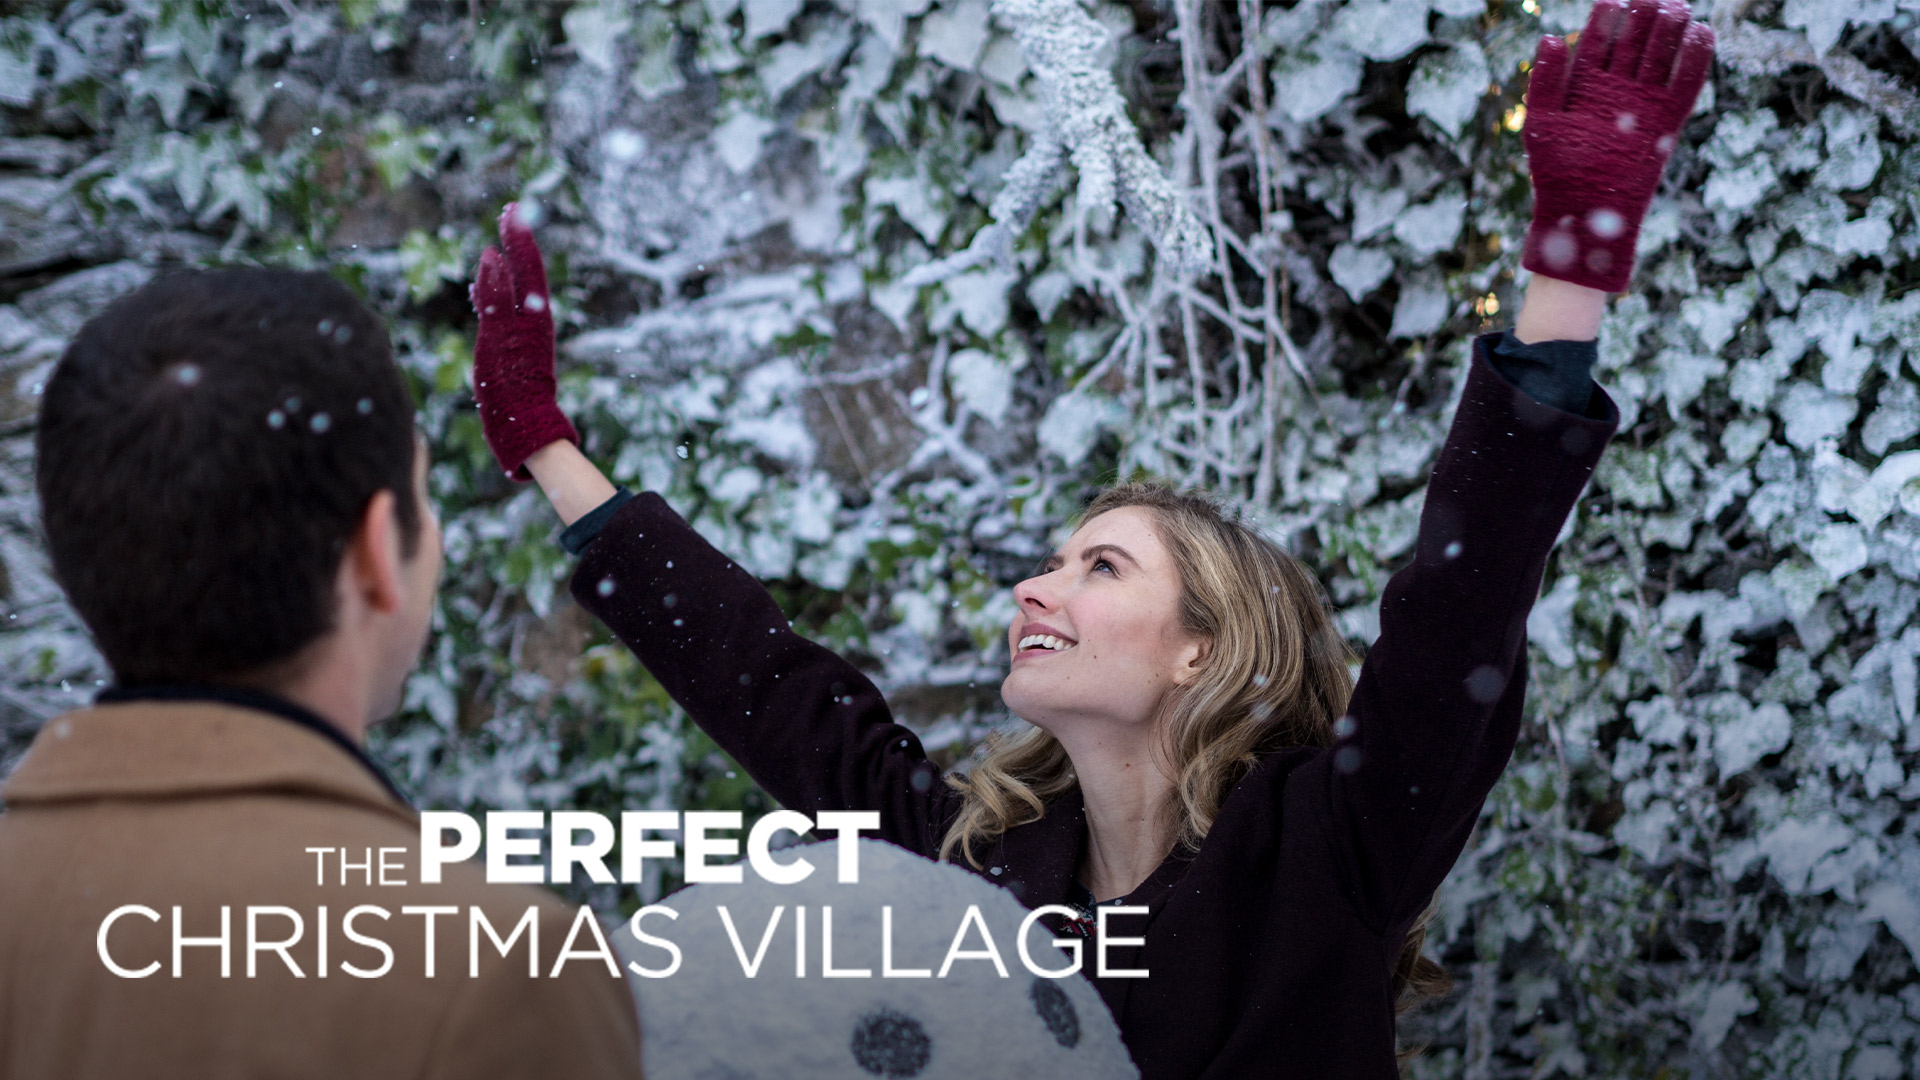 Den helt perfekte jul